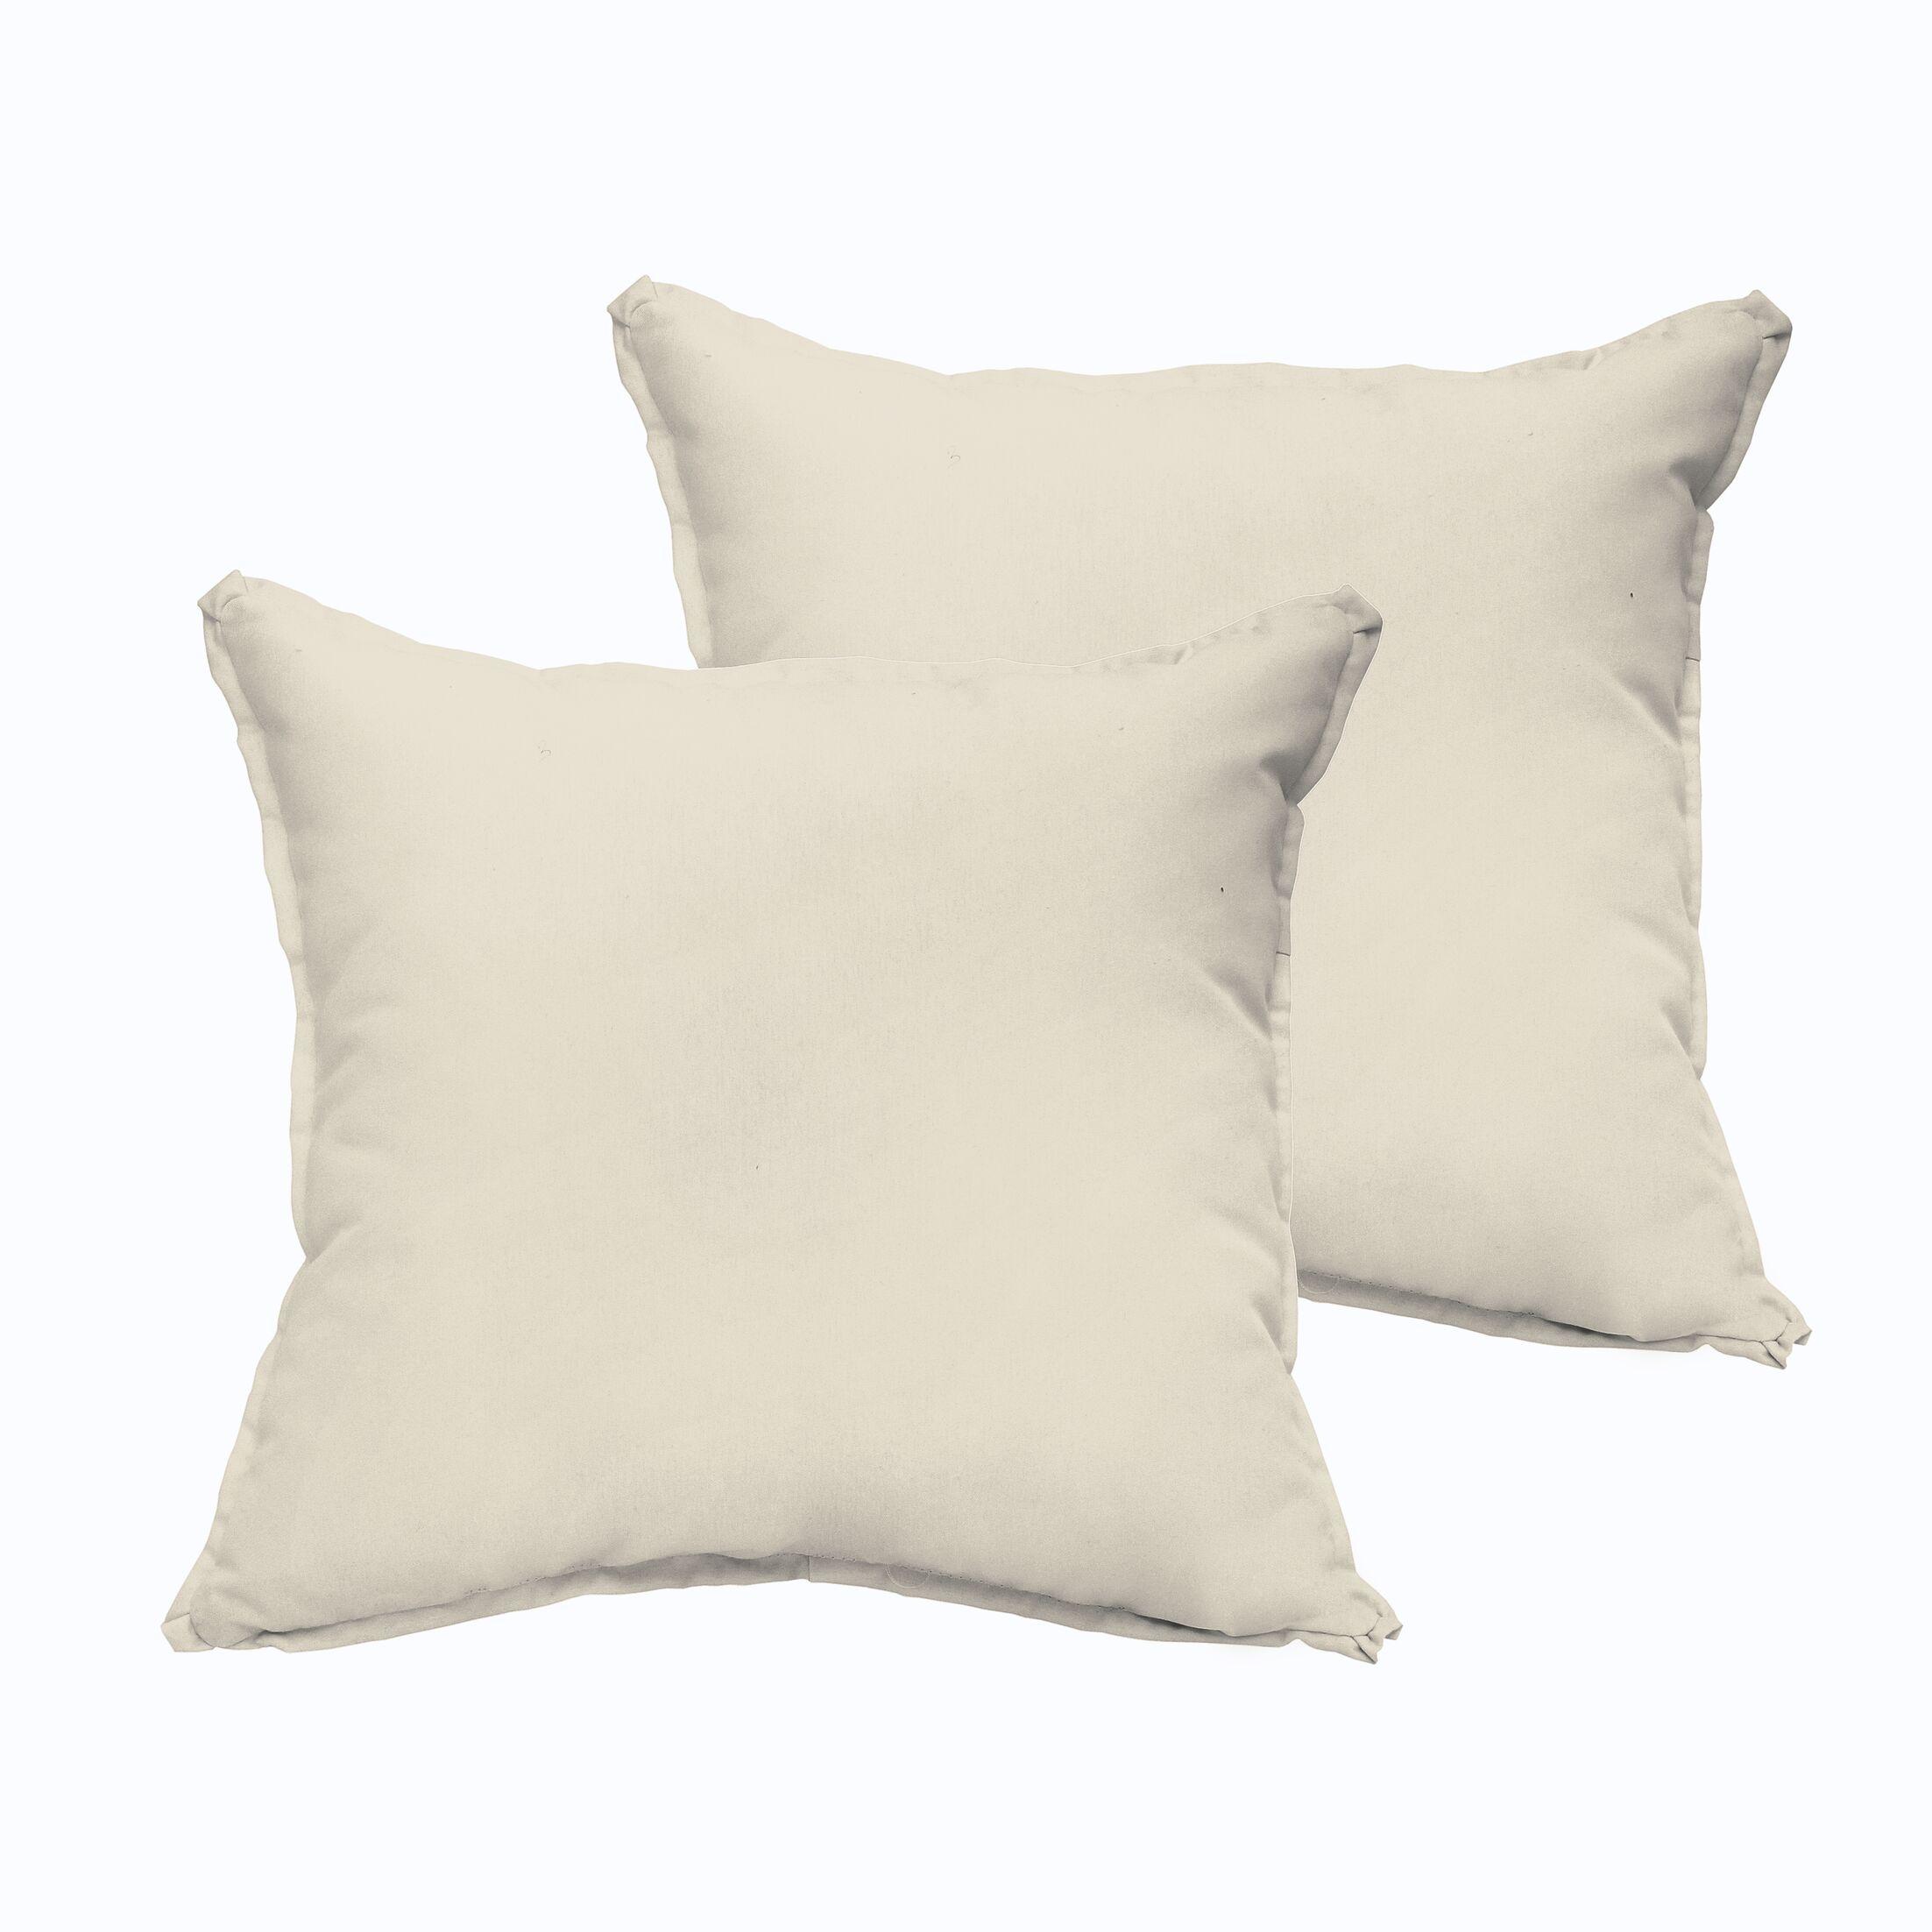 Branan Indoor/Outdoor Throw Pillow Color: Light Blue, Size: 22